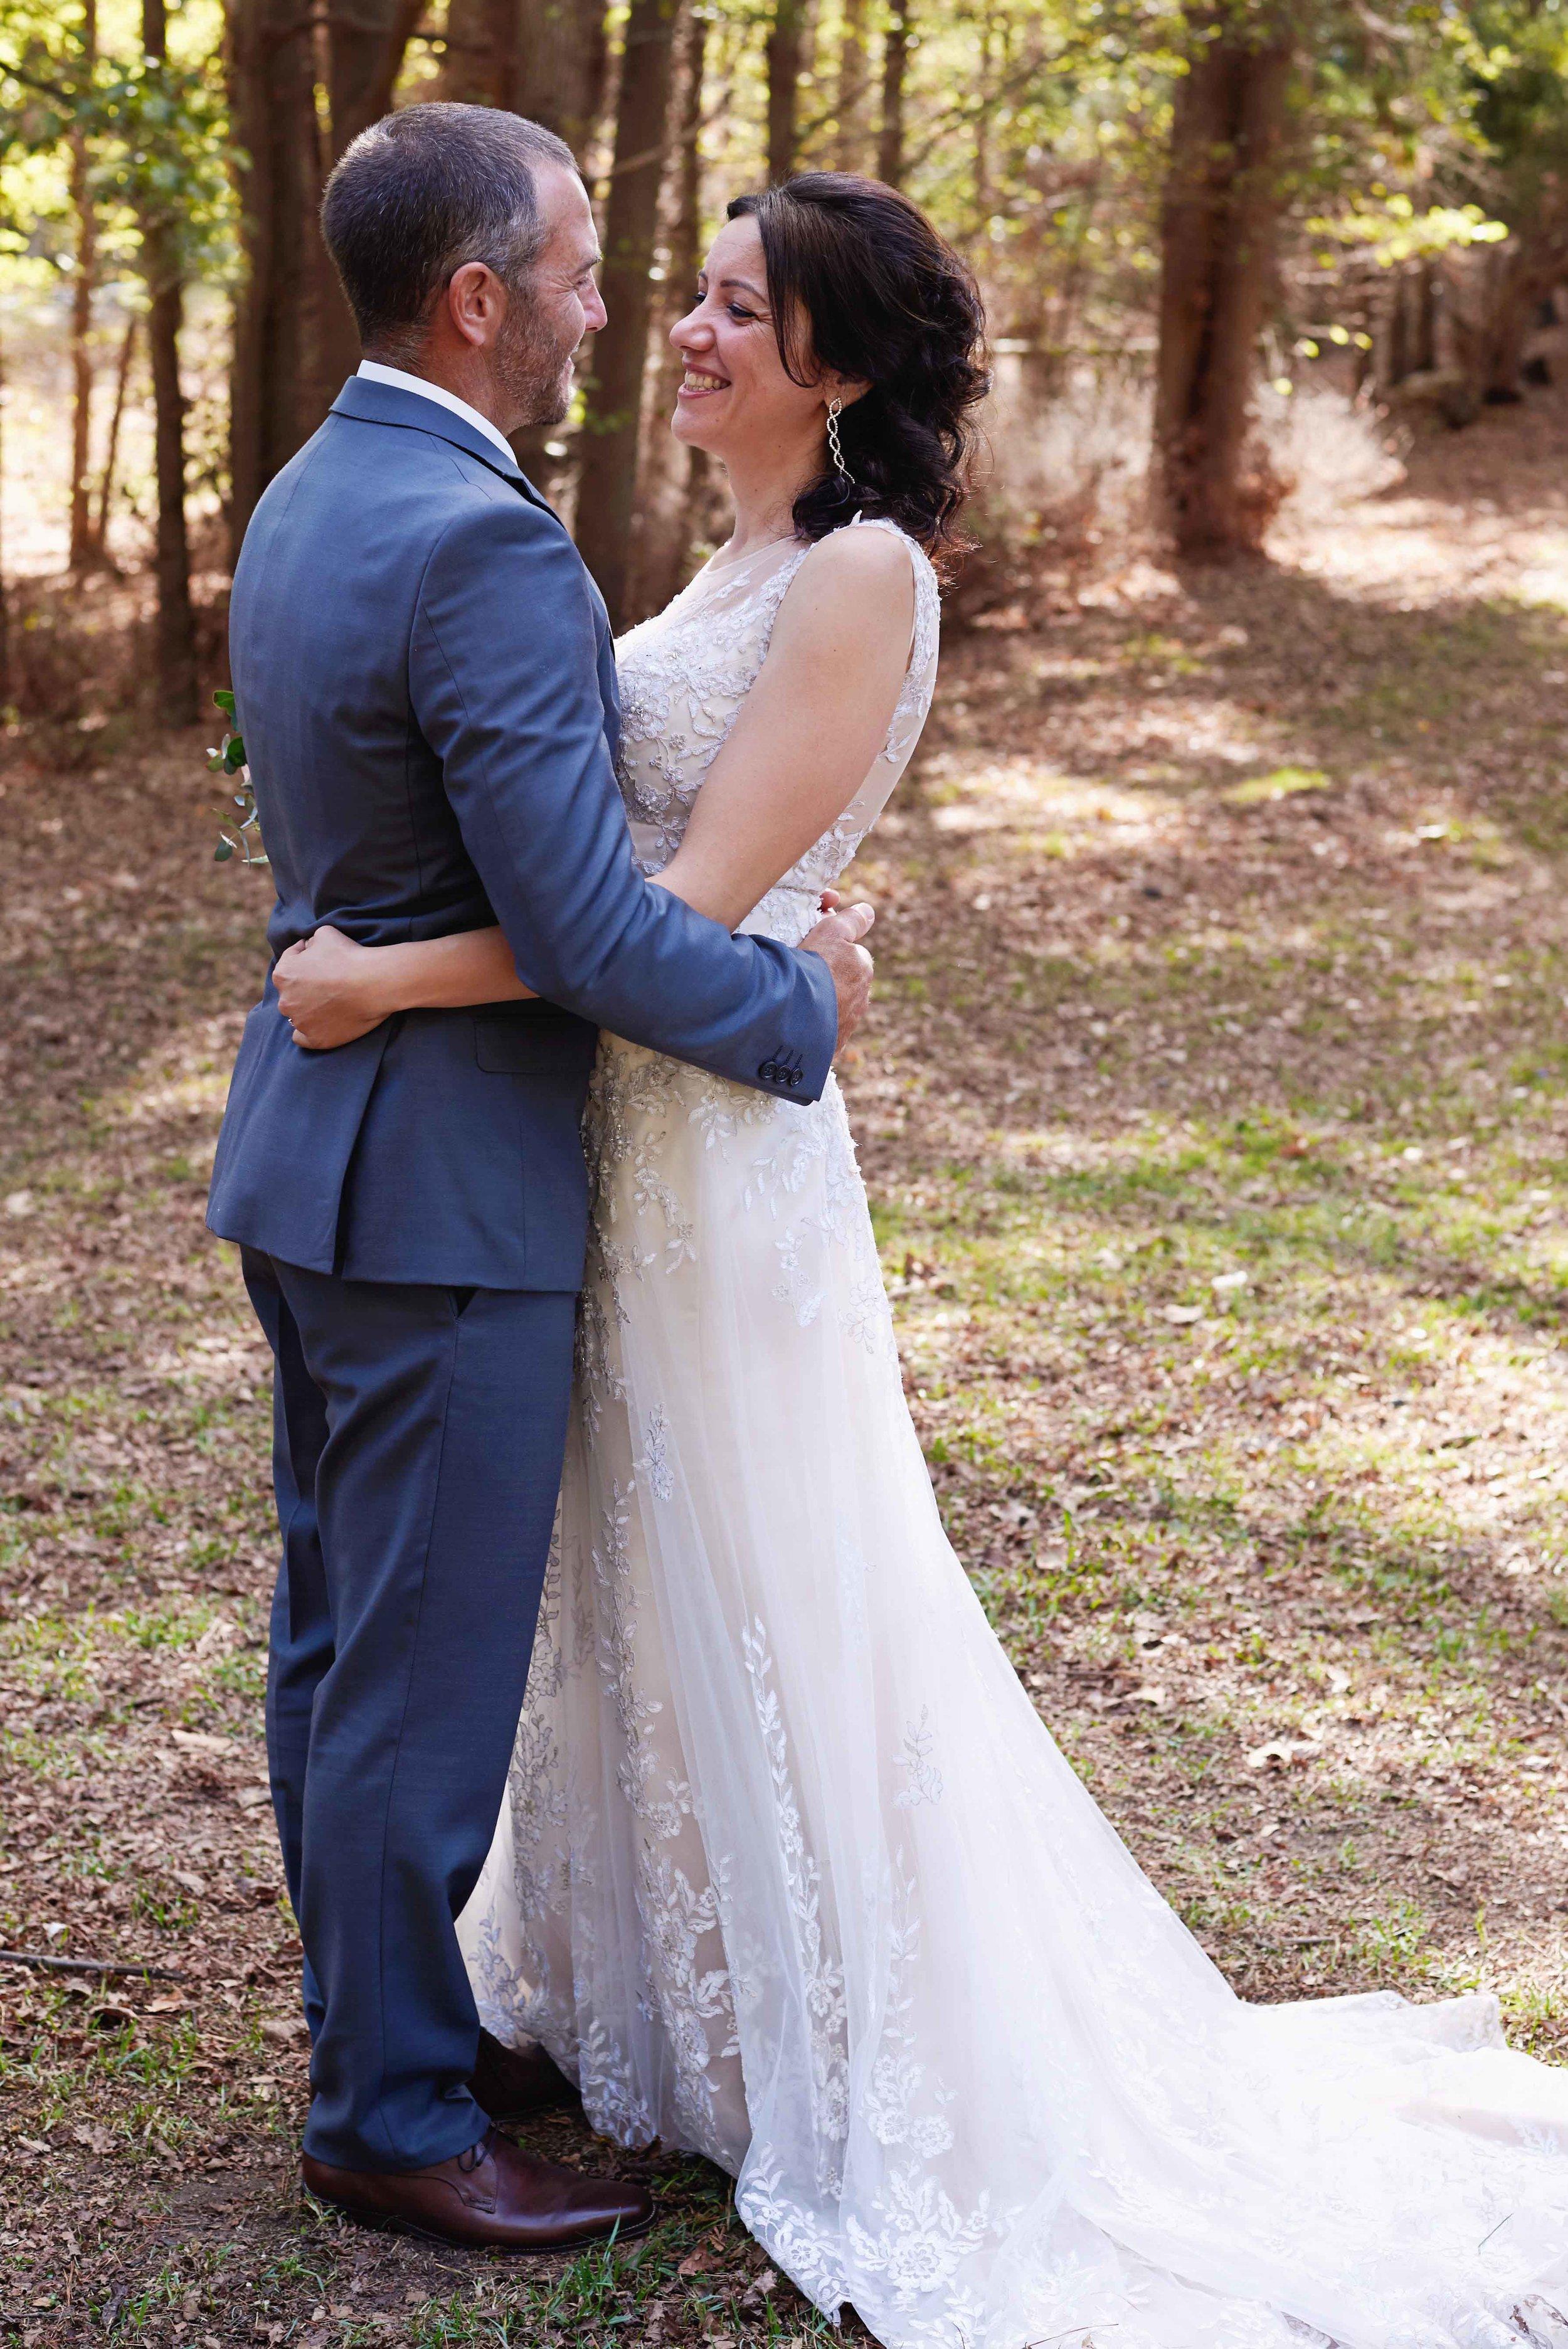 sorrento-wedding-photography-all-smiles-marissa-jade-photography-139.jpg